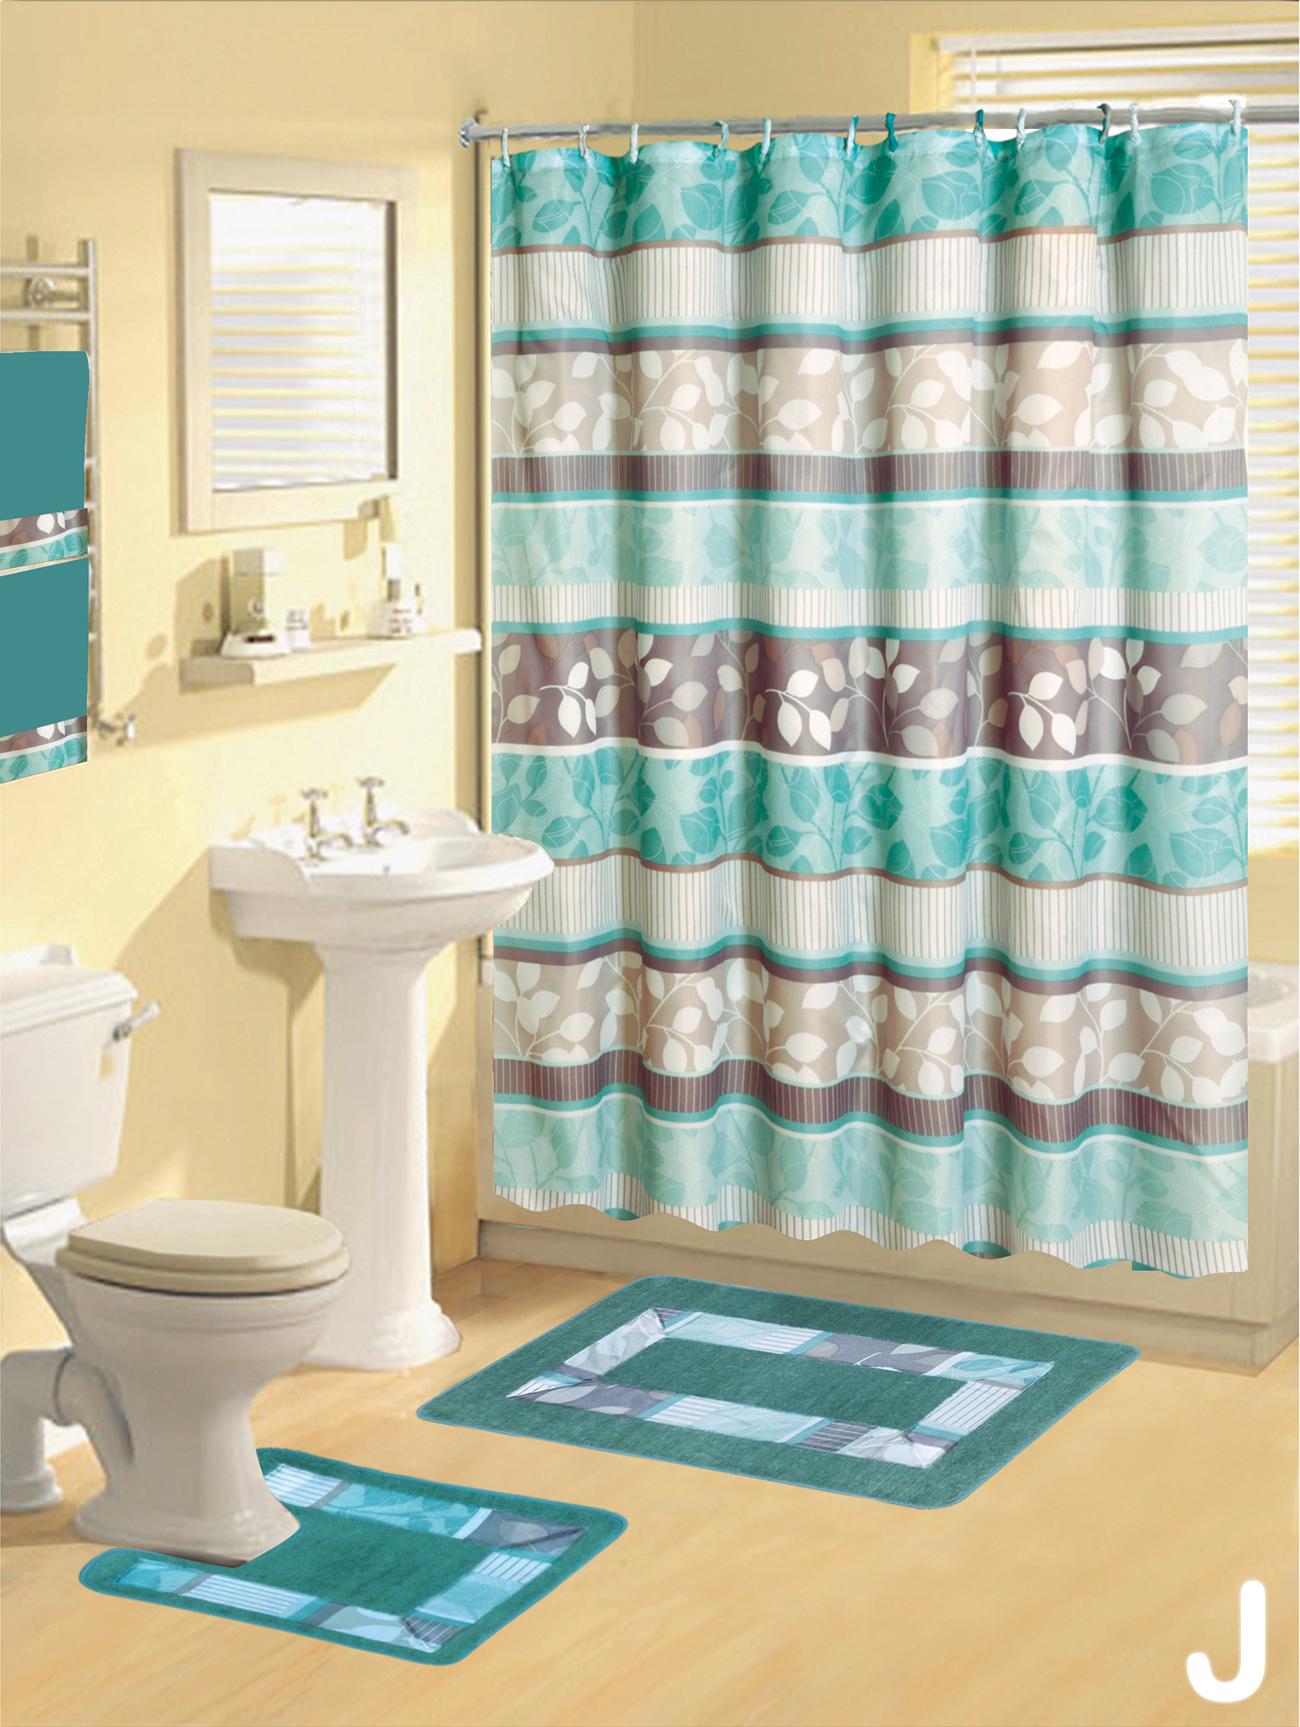 Bathroom shower curtain and rug set - Shower Curtains 17 Pcs Set Contemporary Bath Mat